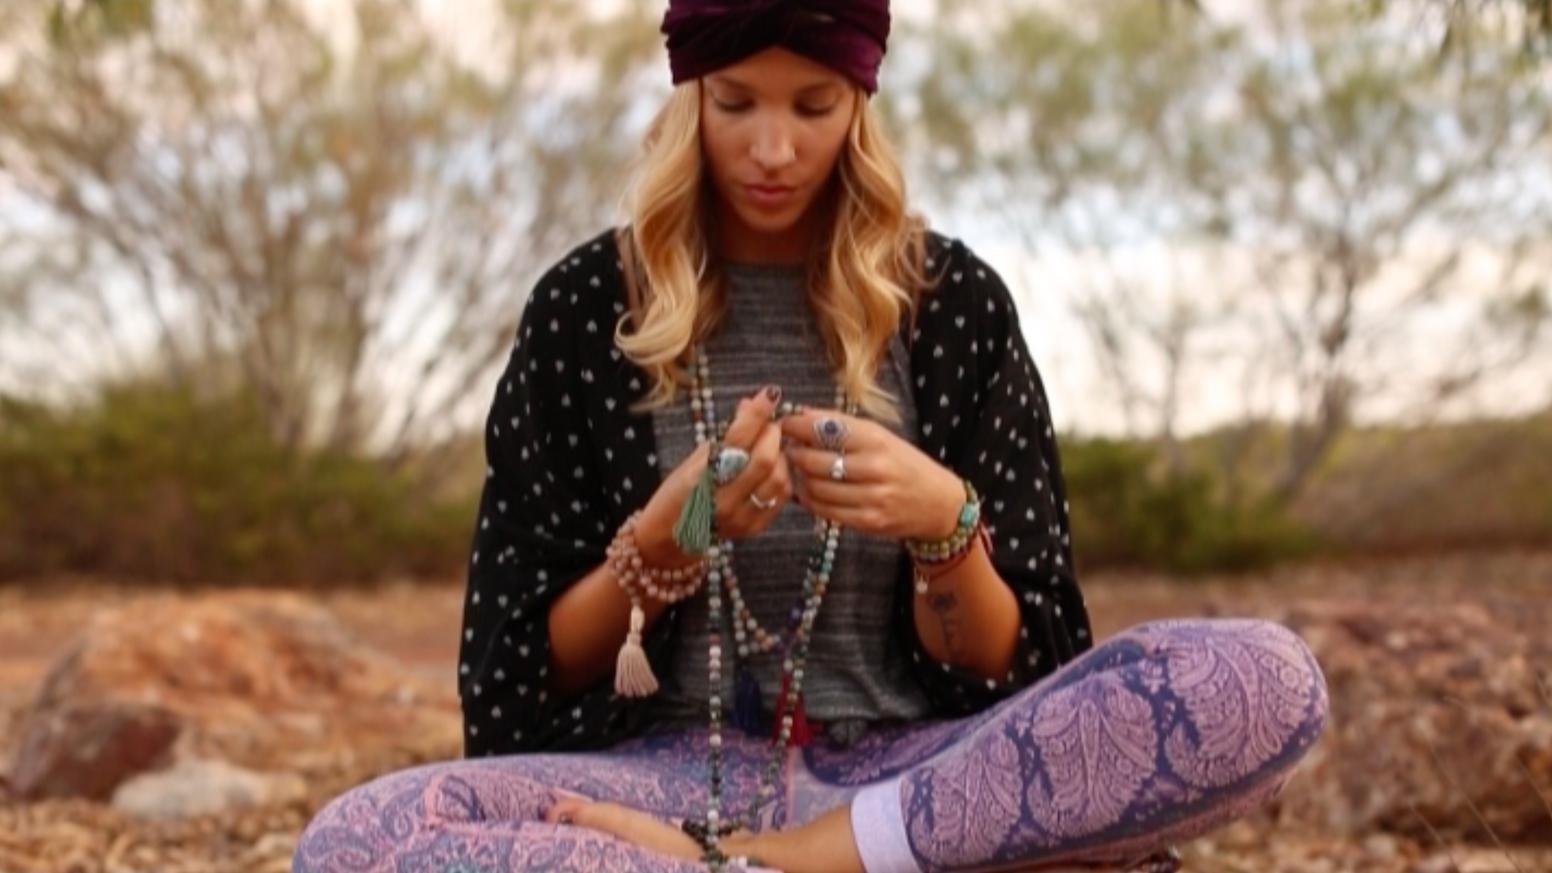 72b45e54d38 The Ripple Project- Mindful Malas by Tara Barchalk — Kickstarter